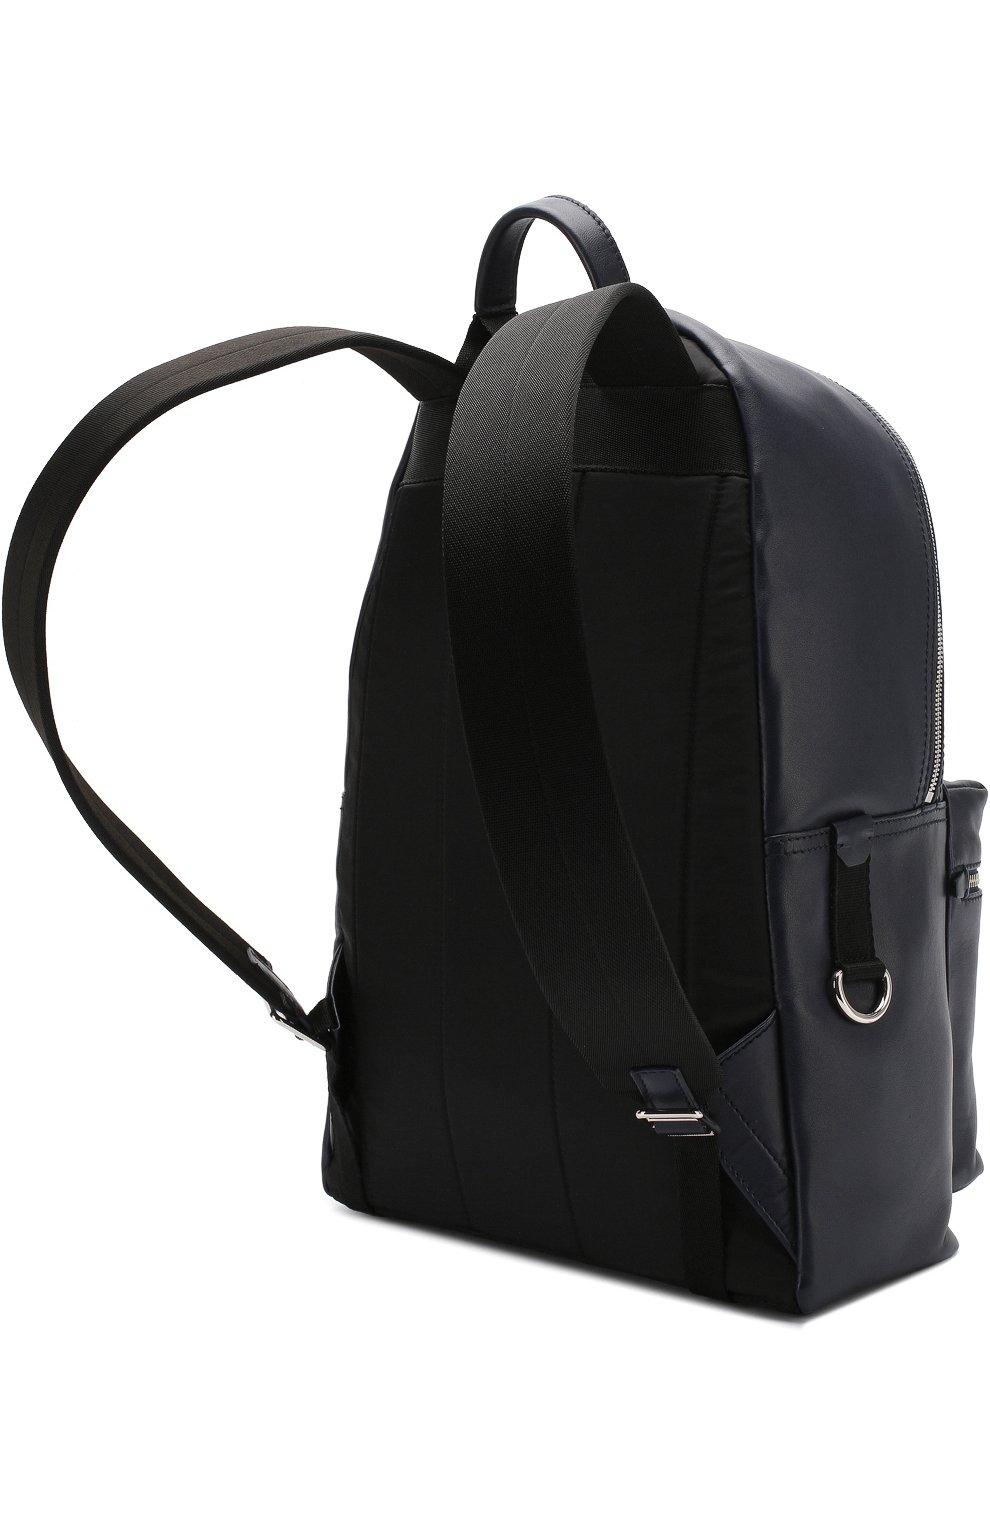 Кожаный рюкзак Vulcano с внешним карманом на молнии Dolce & Gabbana темно-синий | Фото №3